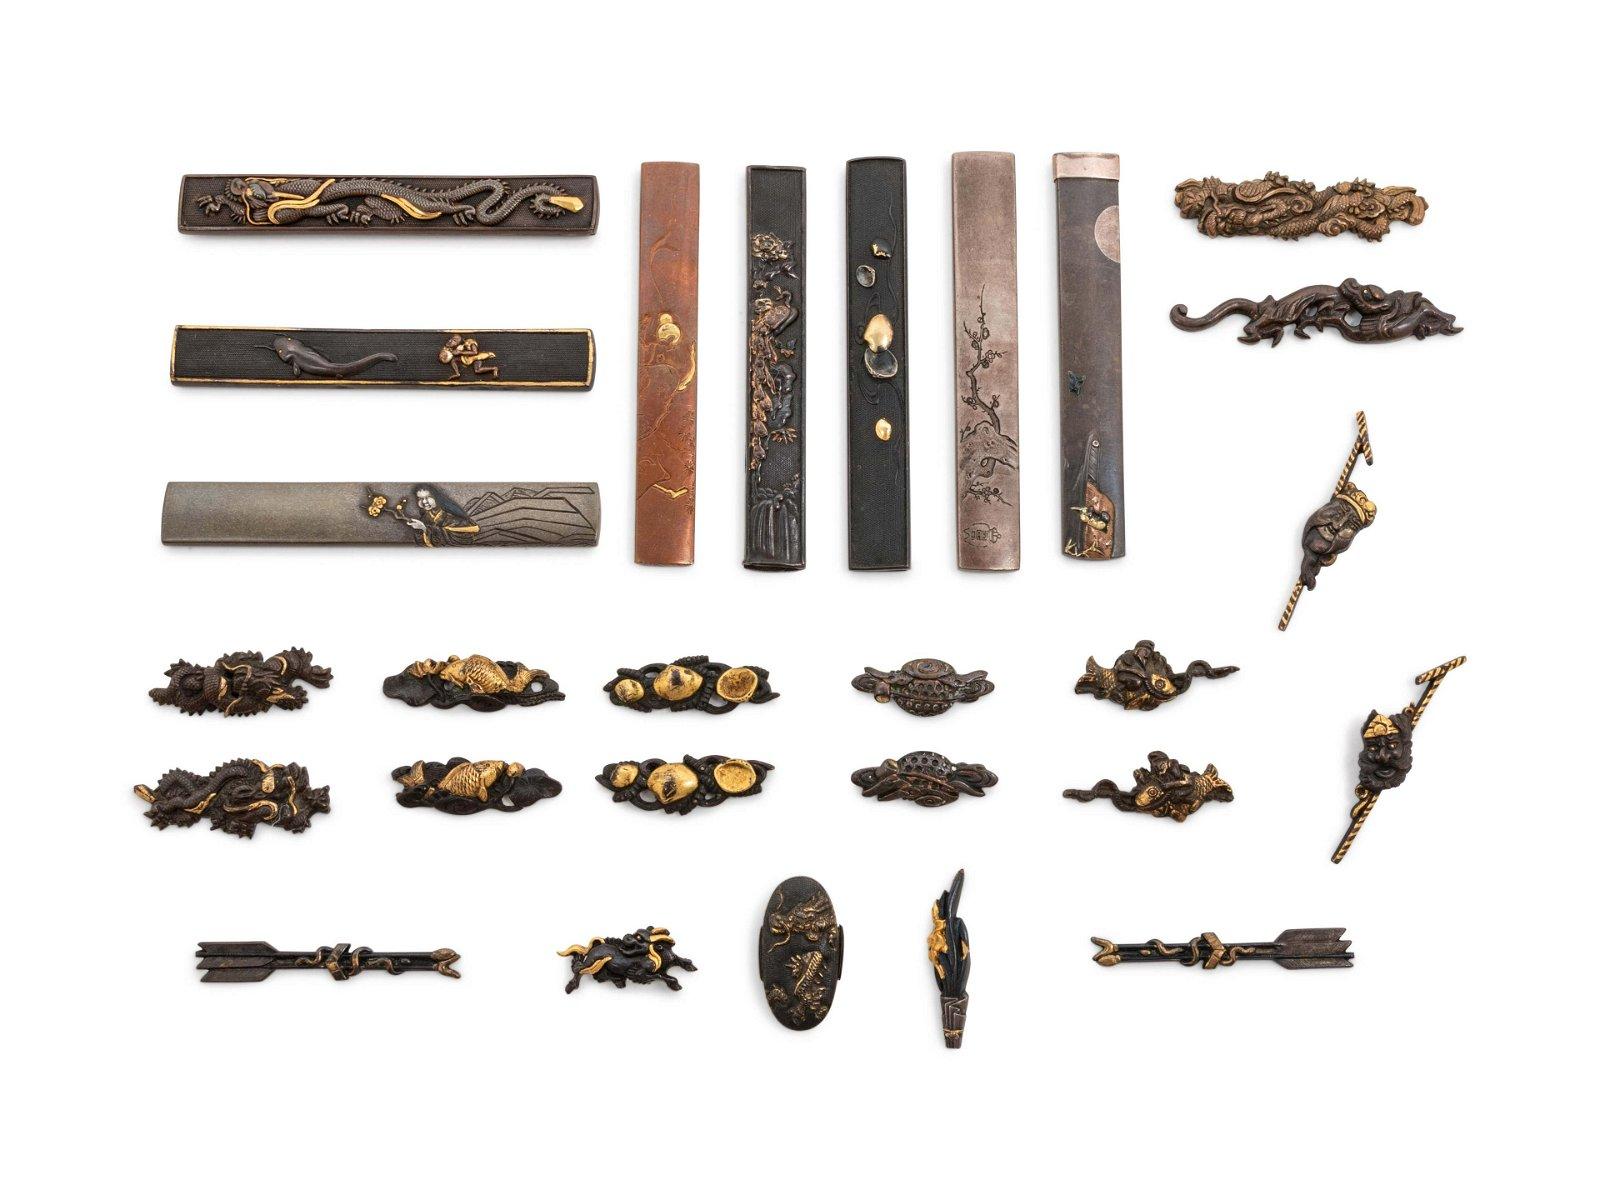 Twenty-Seven Mixed Metal Sword Fittings